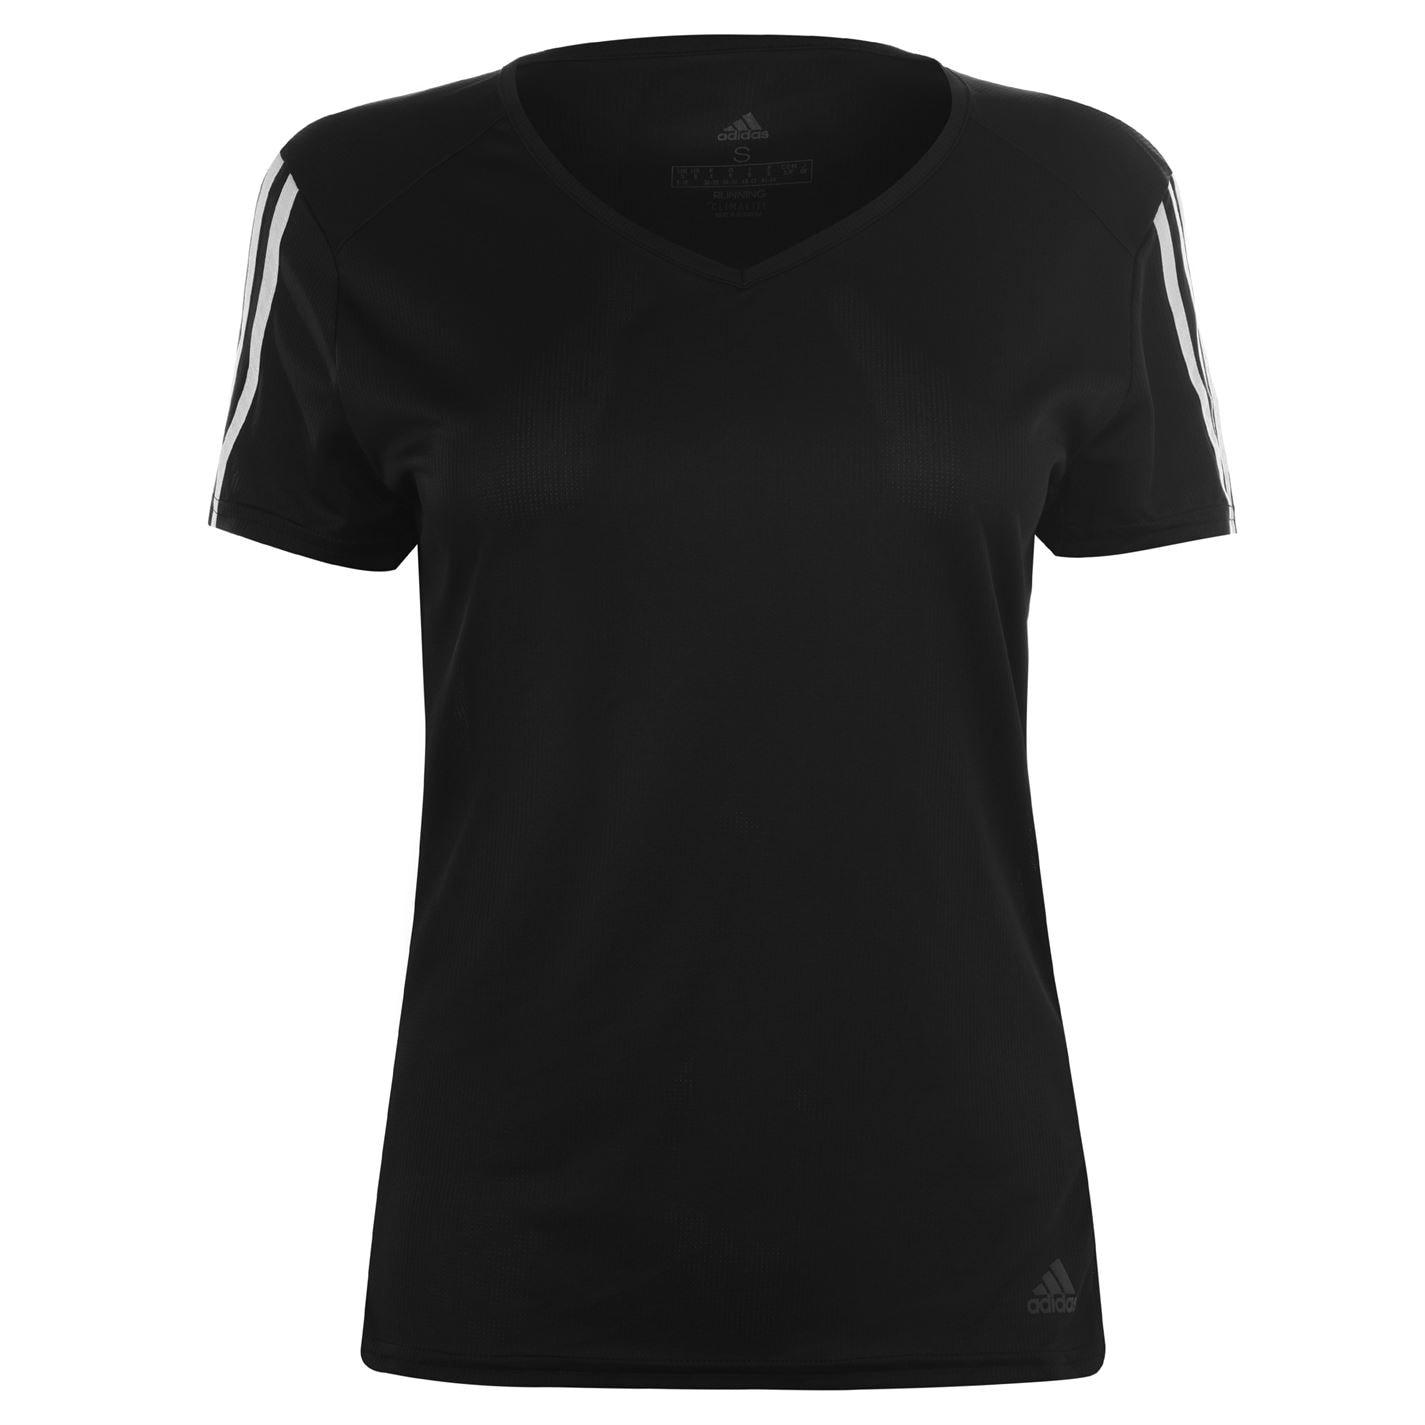 Adidas Womens Run It 3-Stripes Graphic T-Shirt